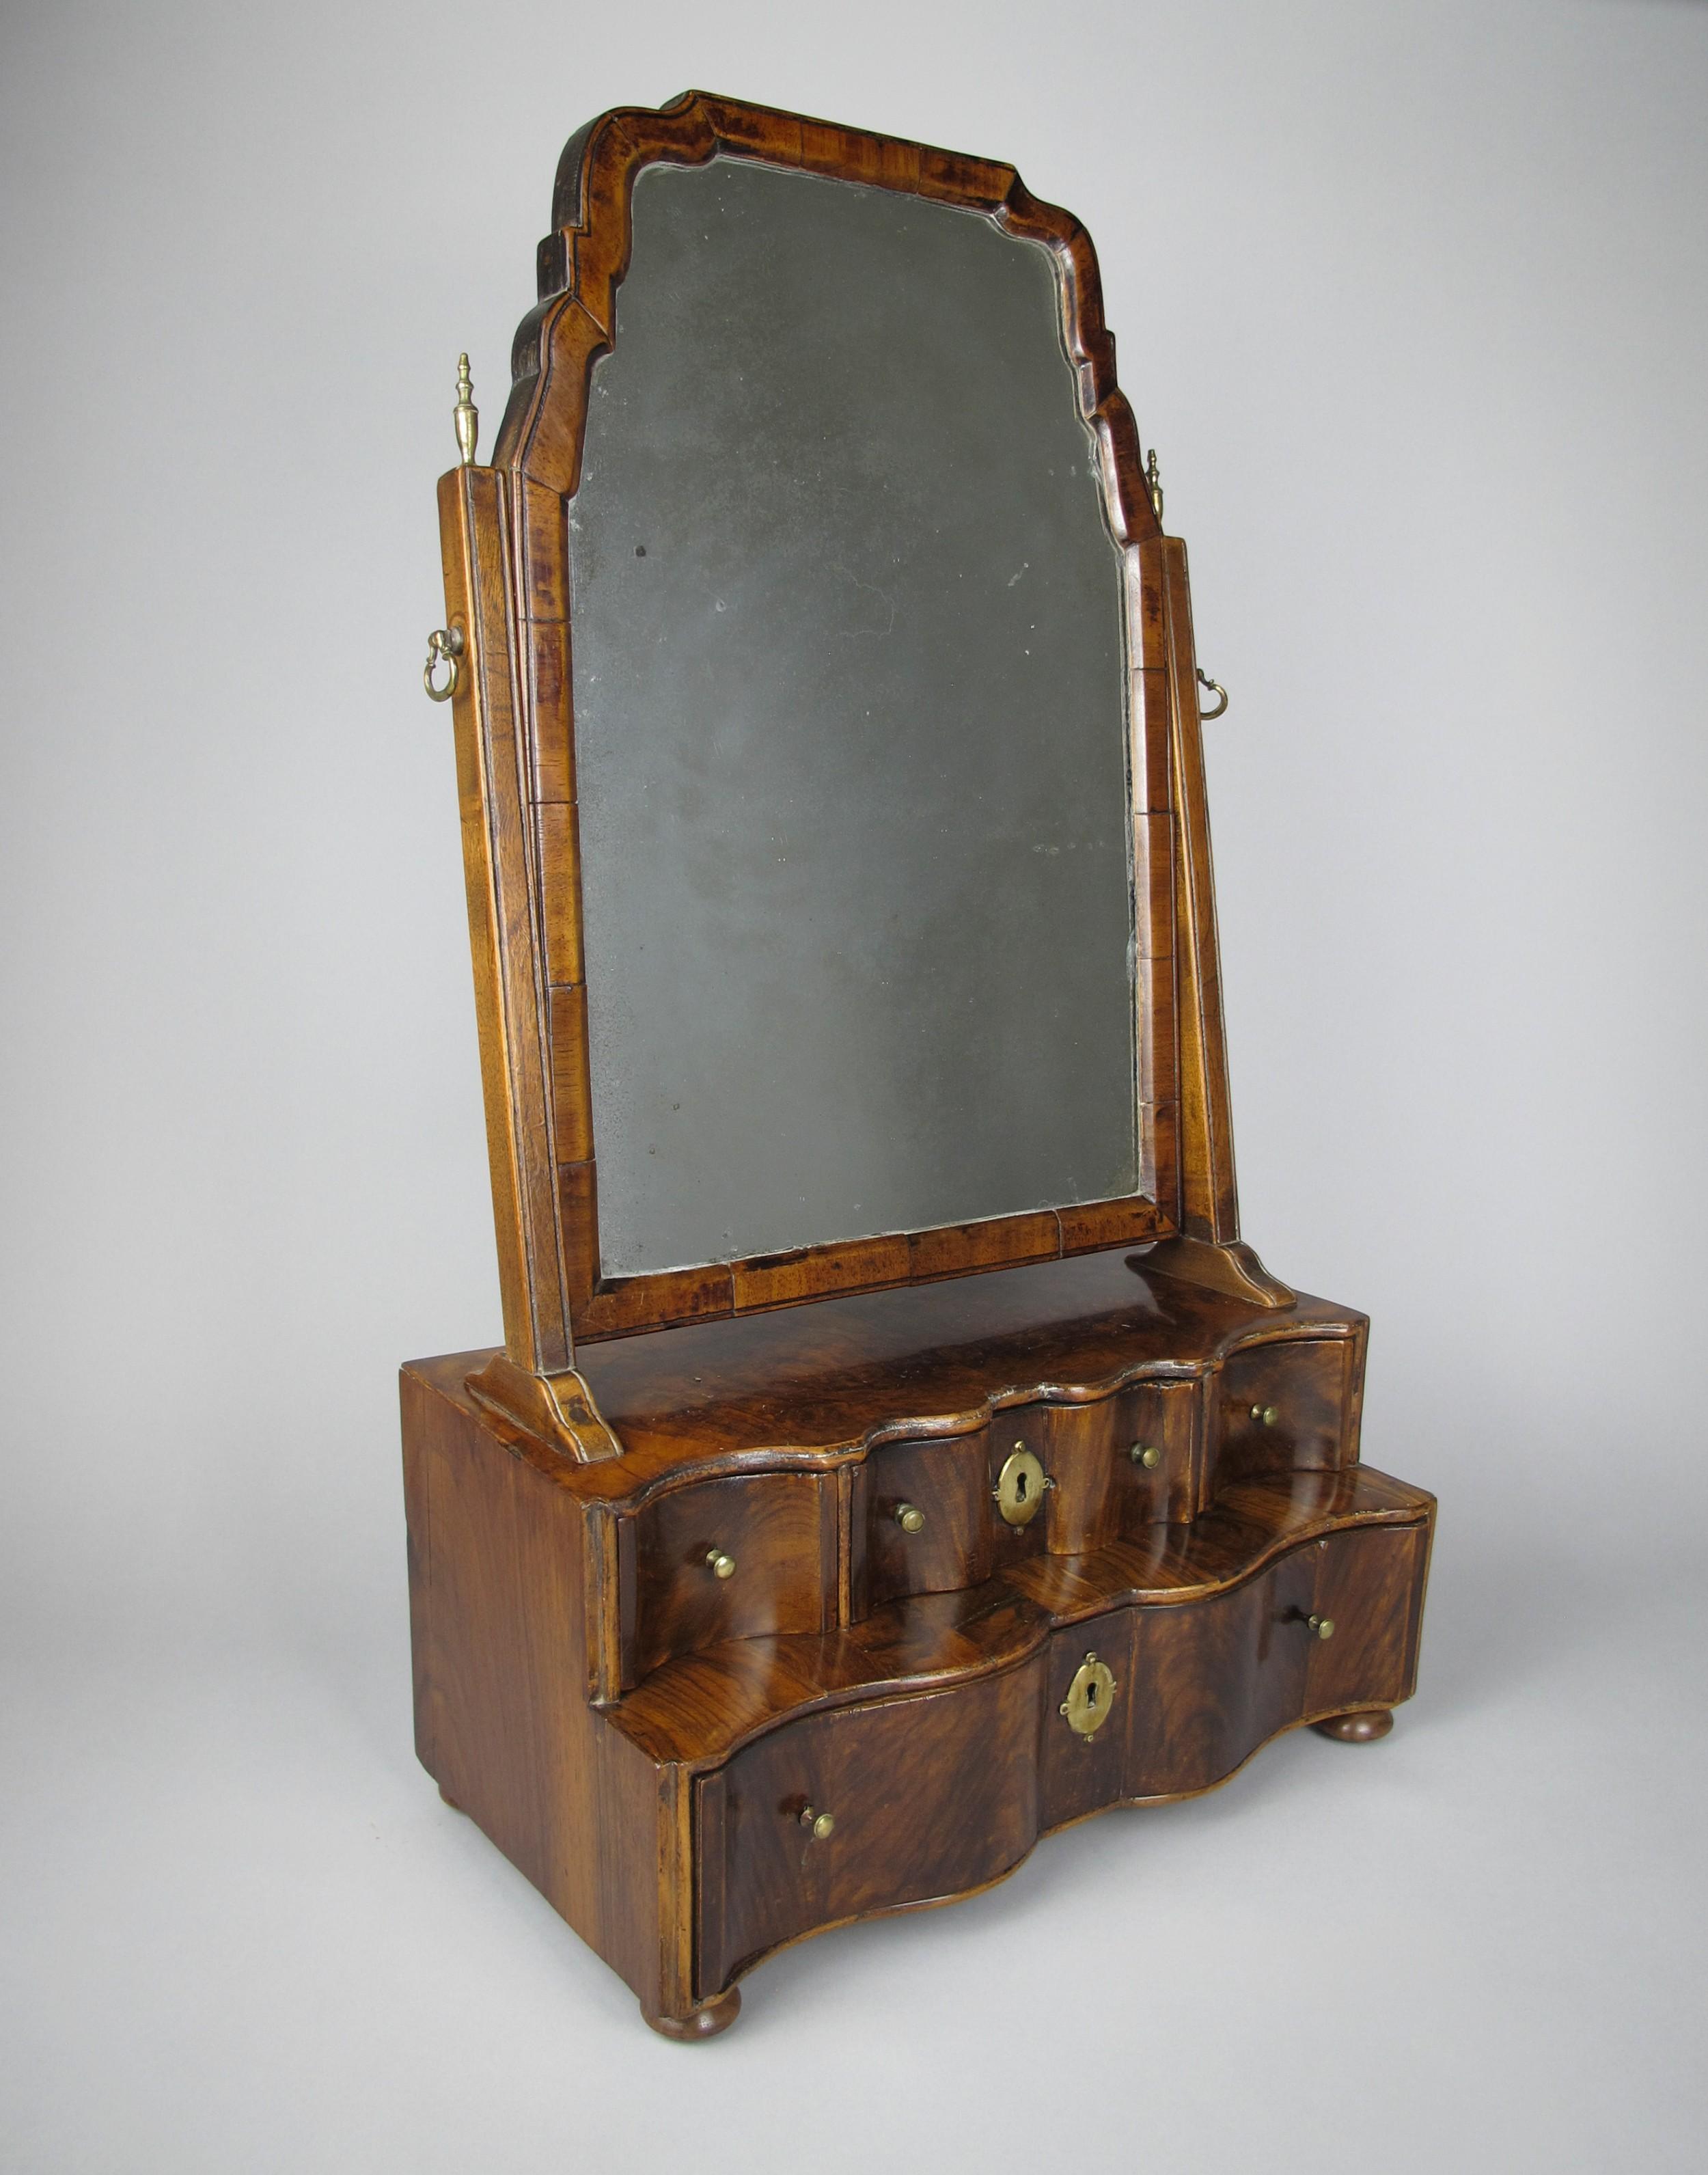 george i walnut swing mirror with four serpentine drawers c1720